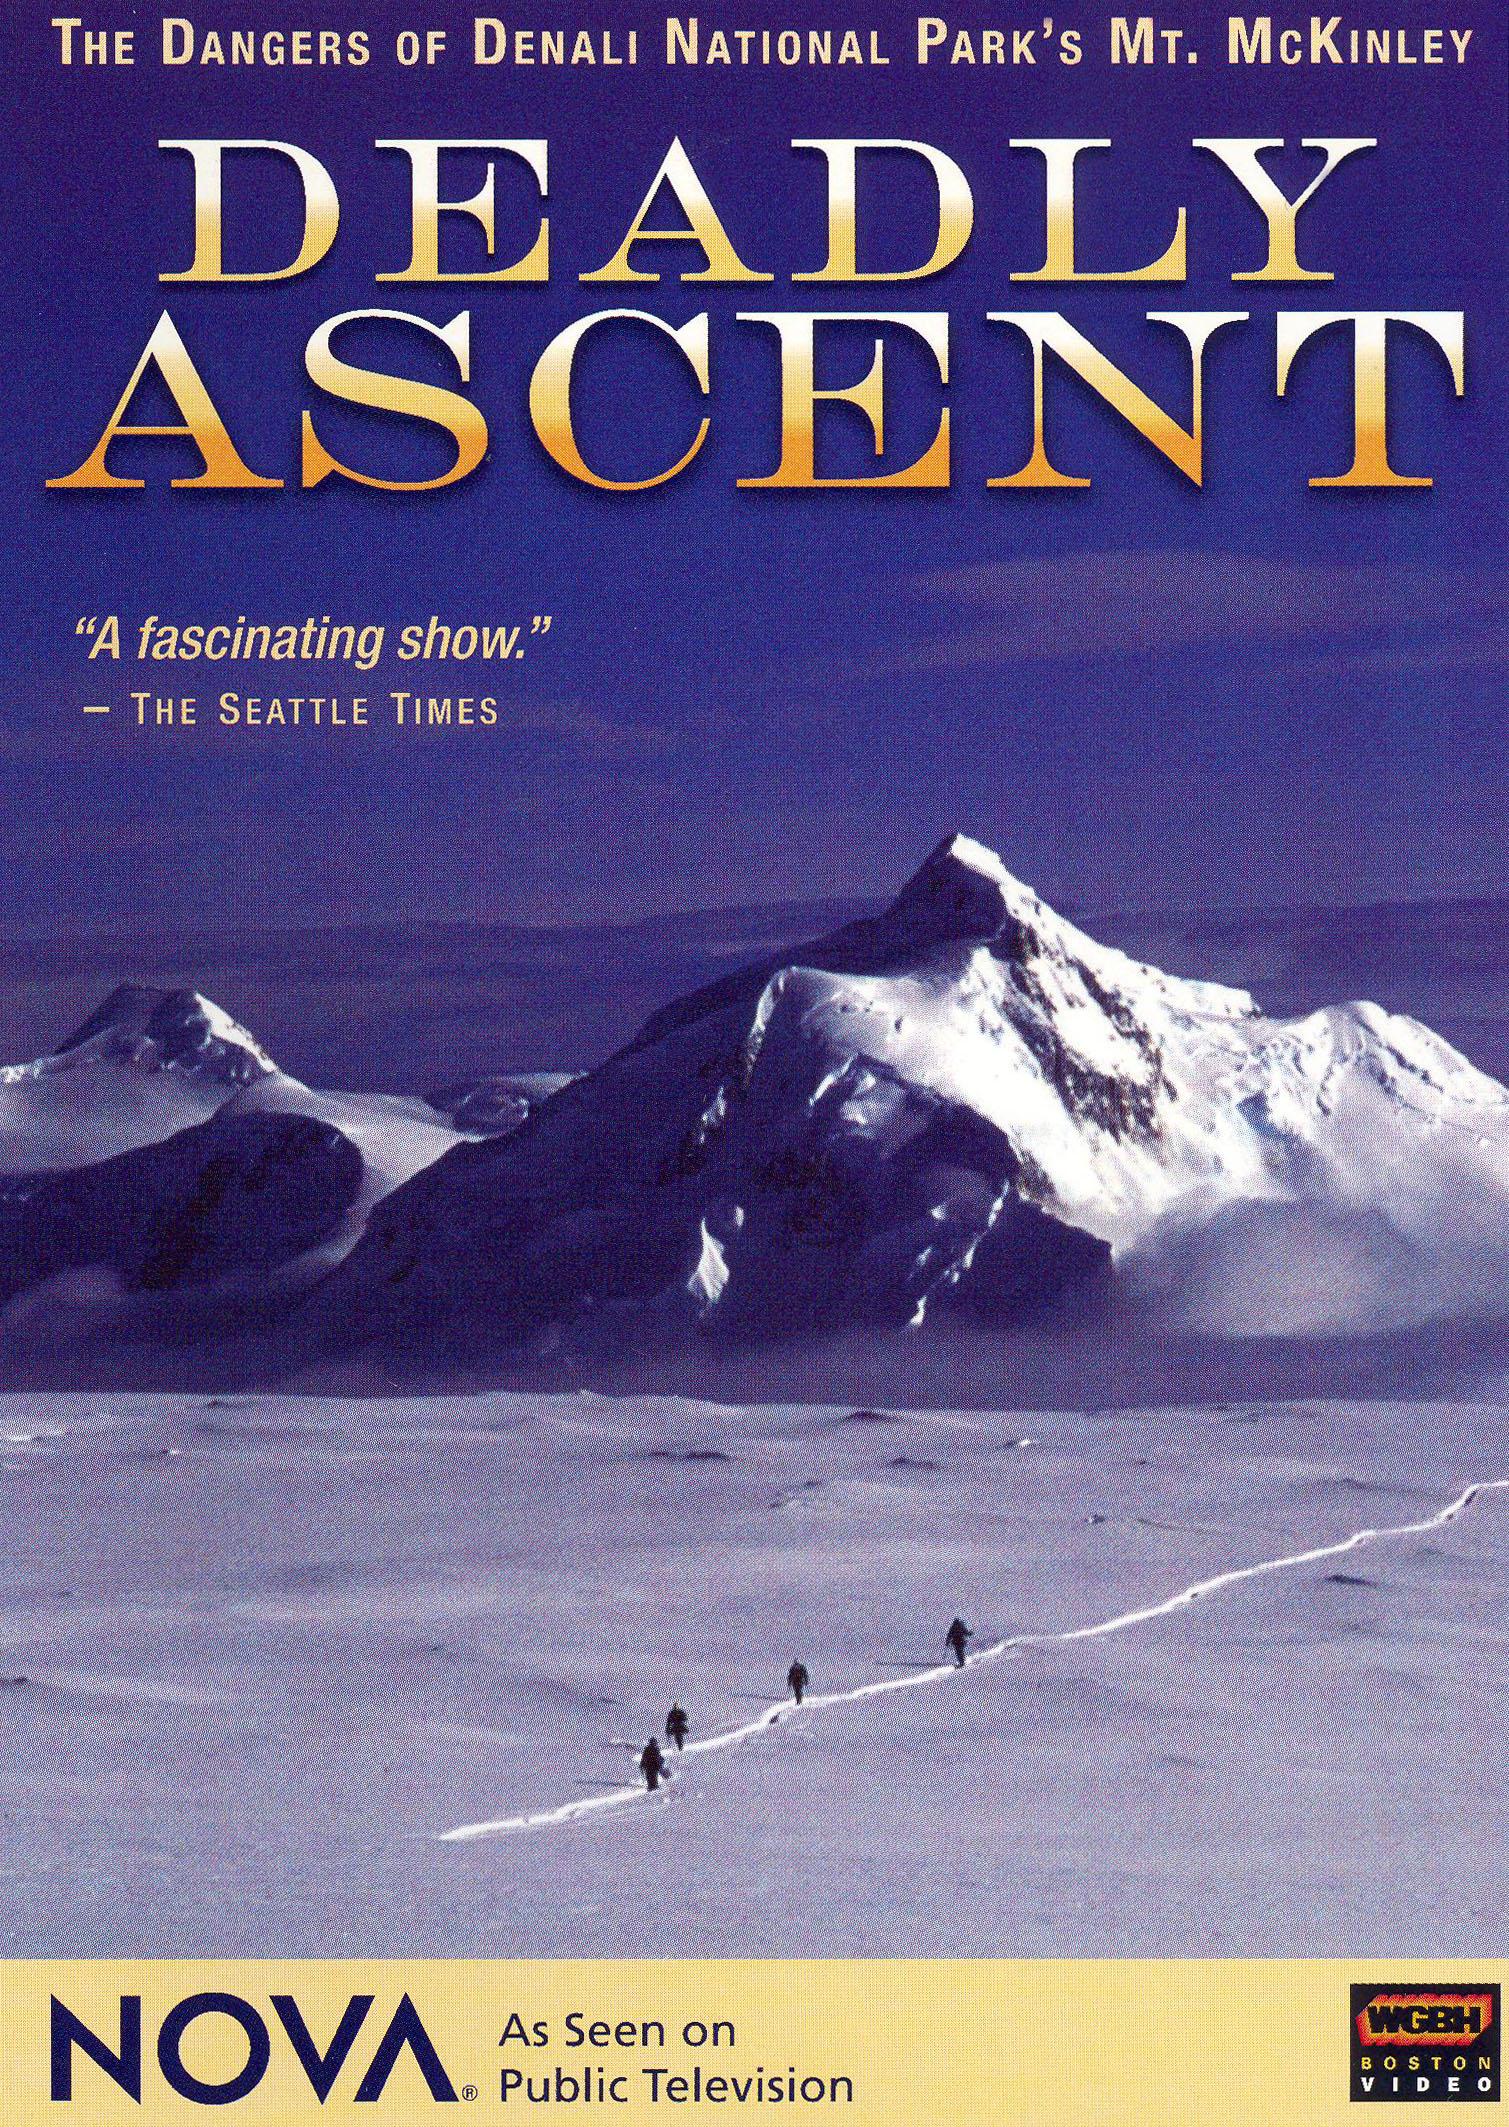 NOVA: Deadly Ascent - Mt. McKinley